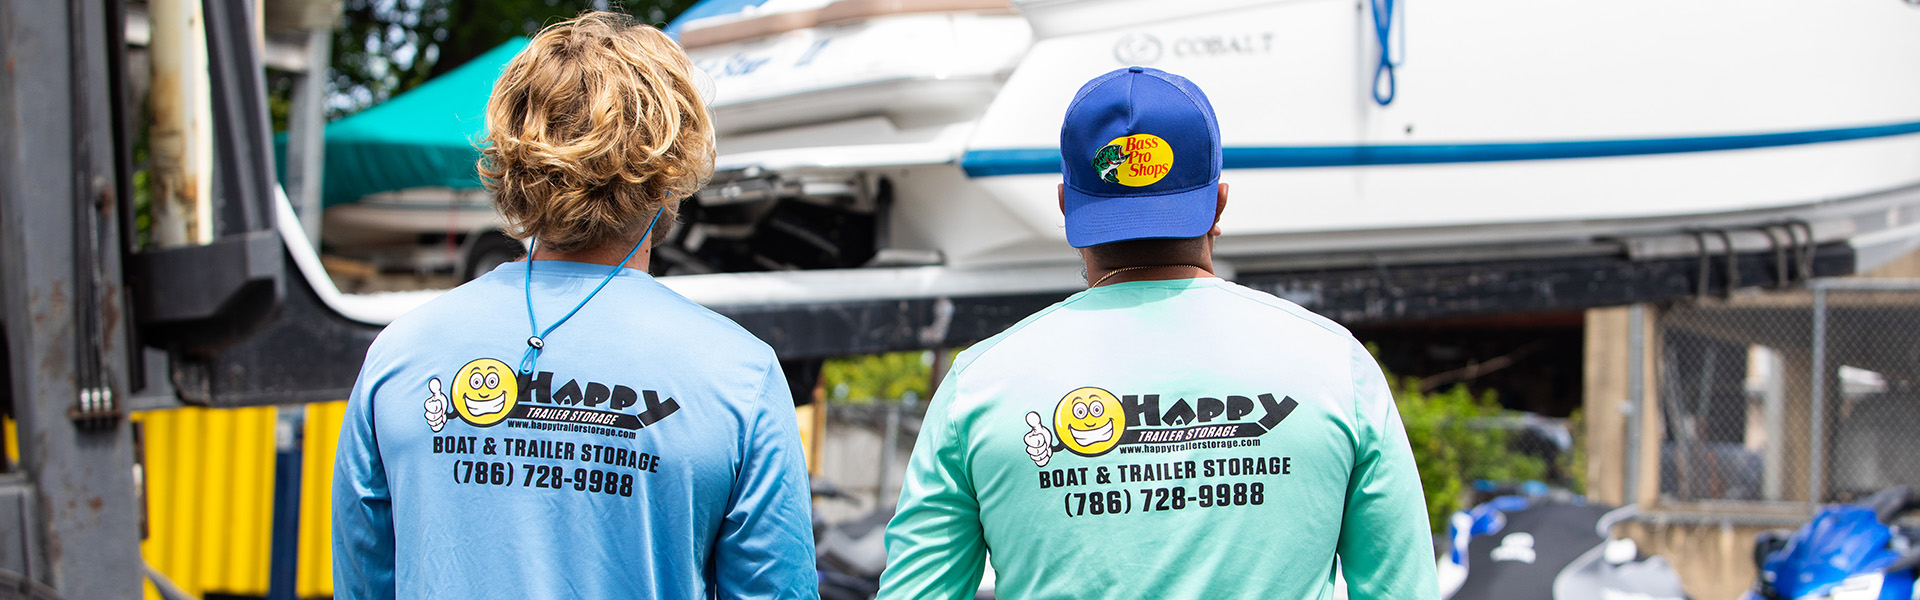 happy trailer storage miami boat storage facility